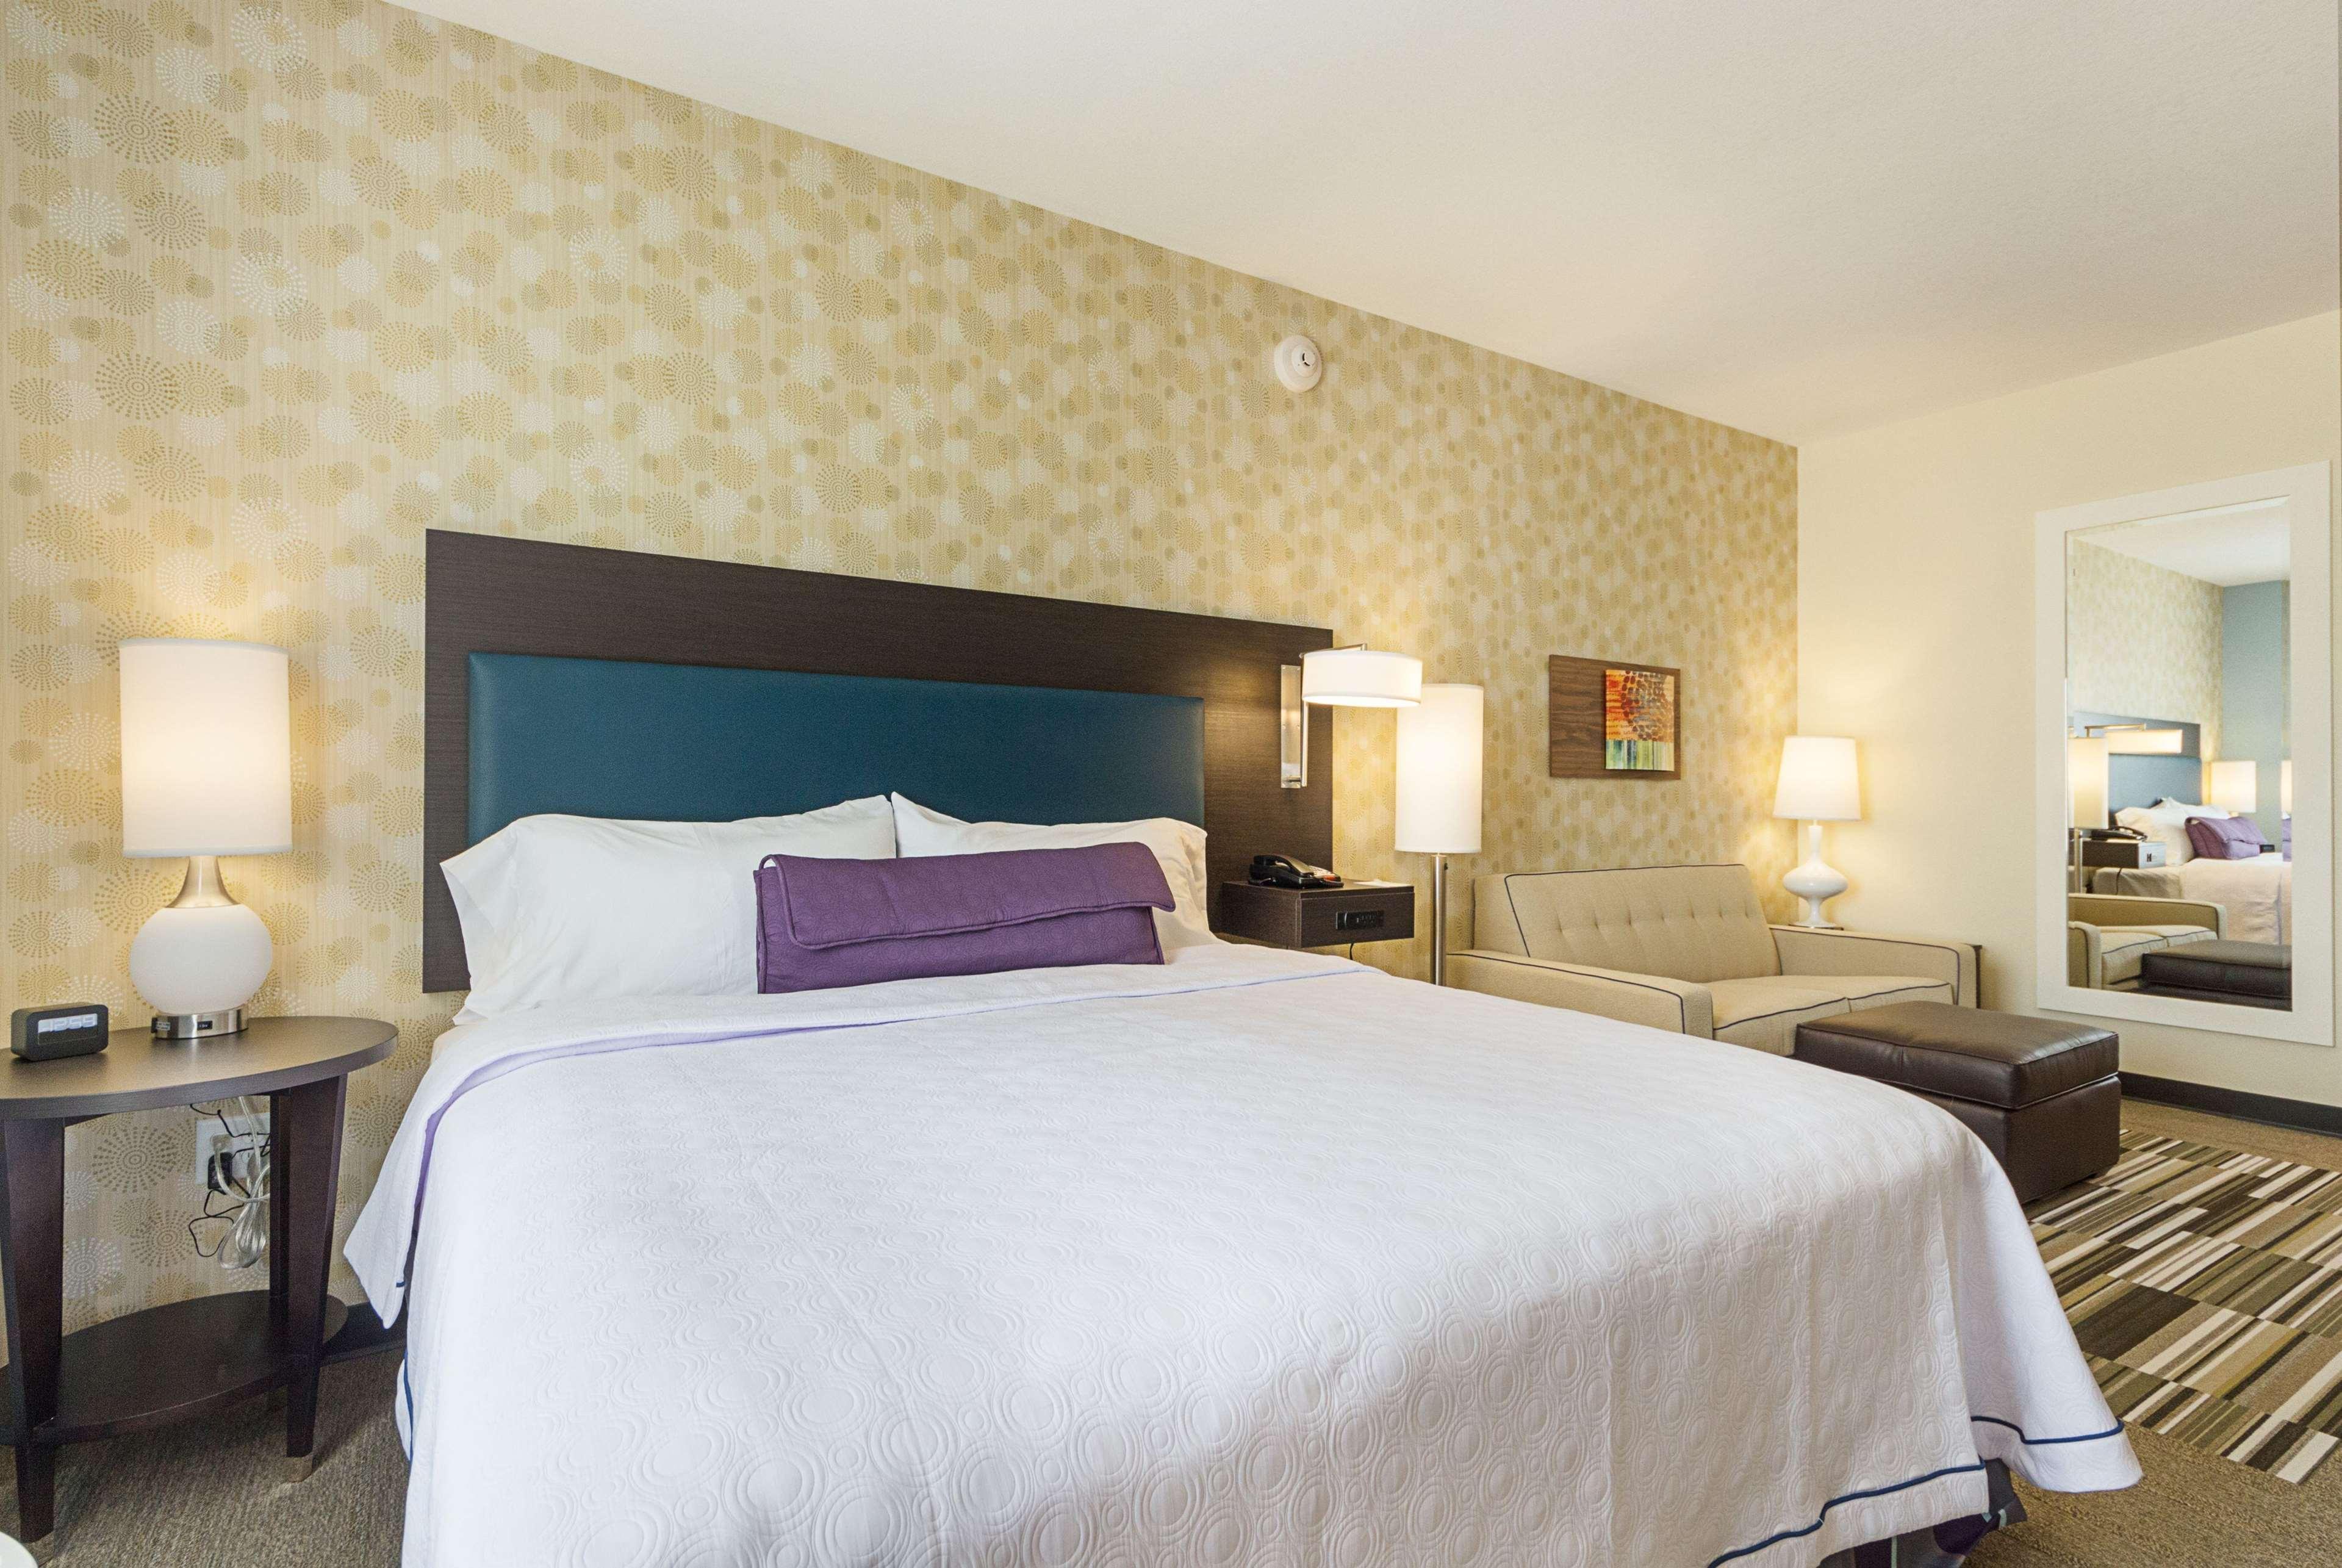 Home 2 Suites by Hilton - Yukon image 31